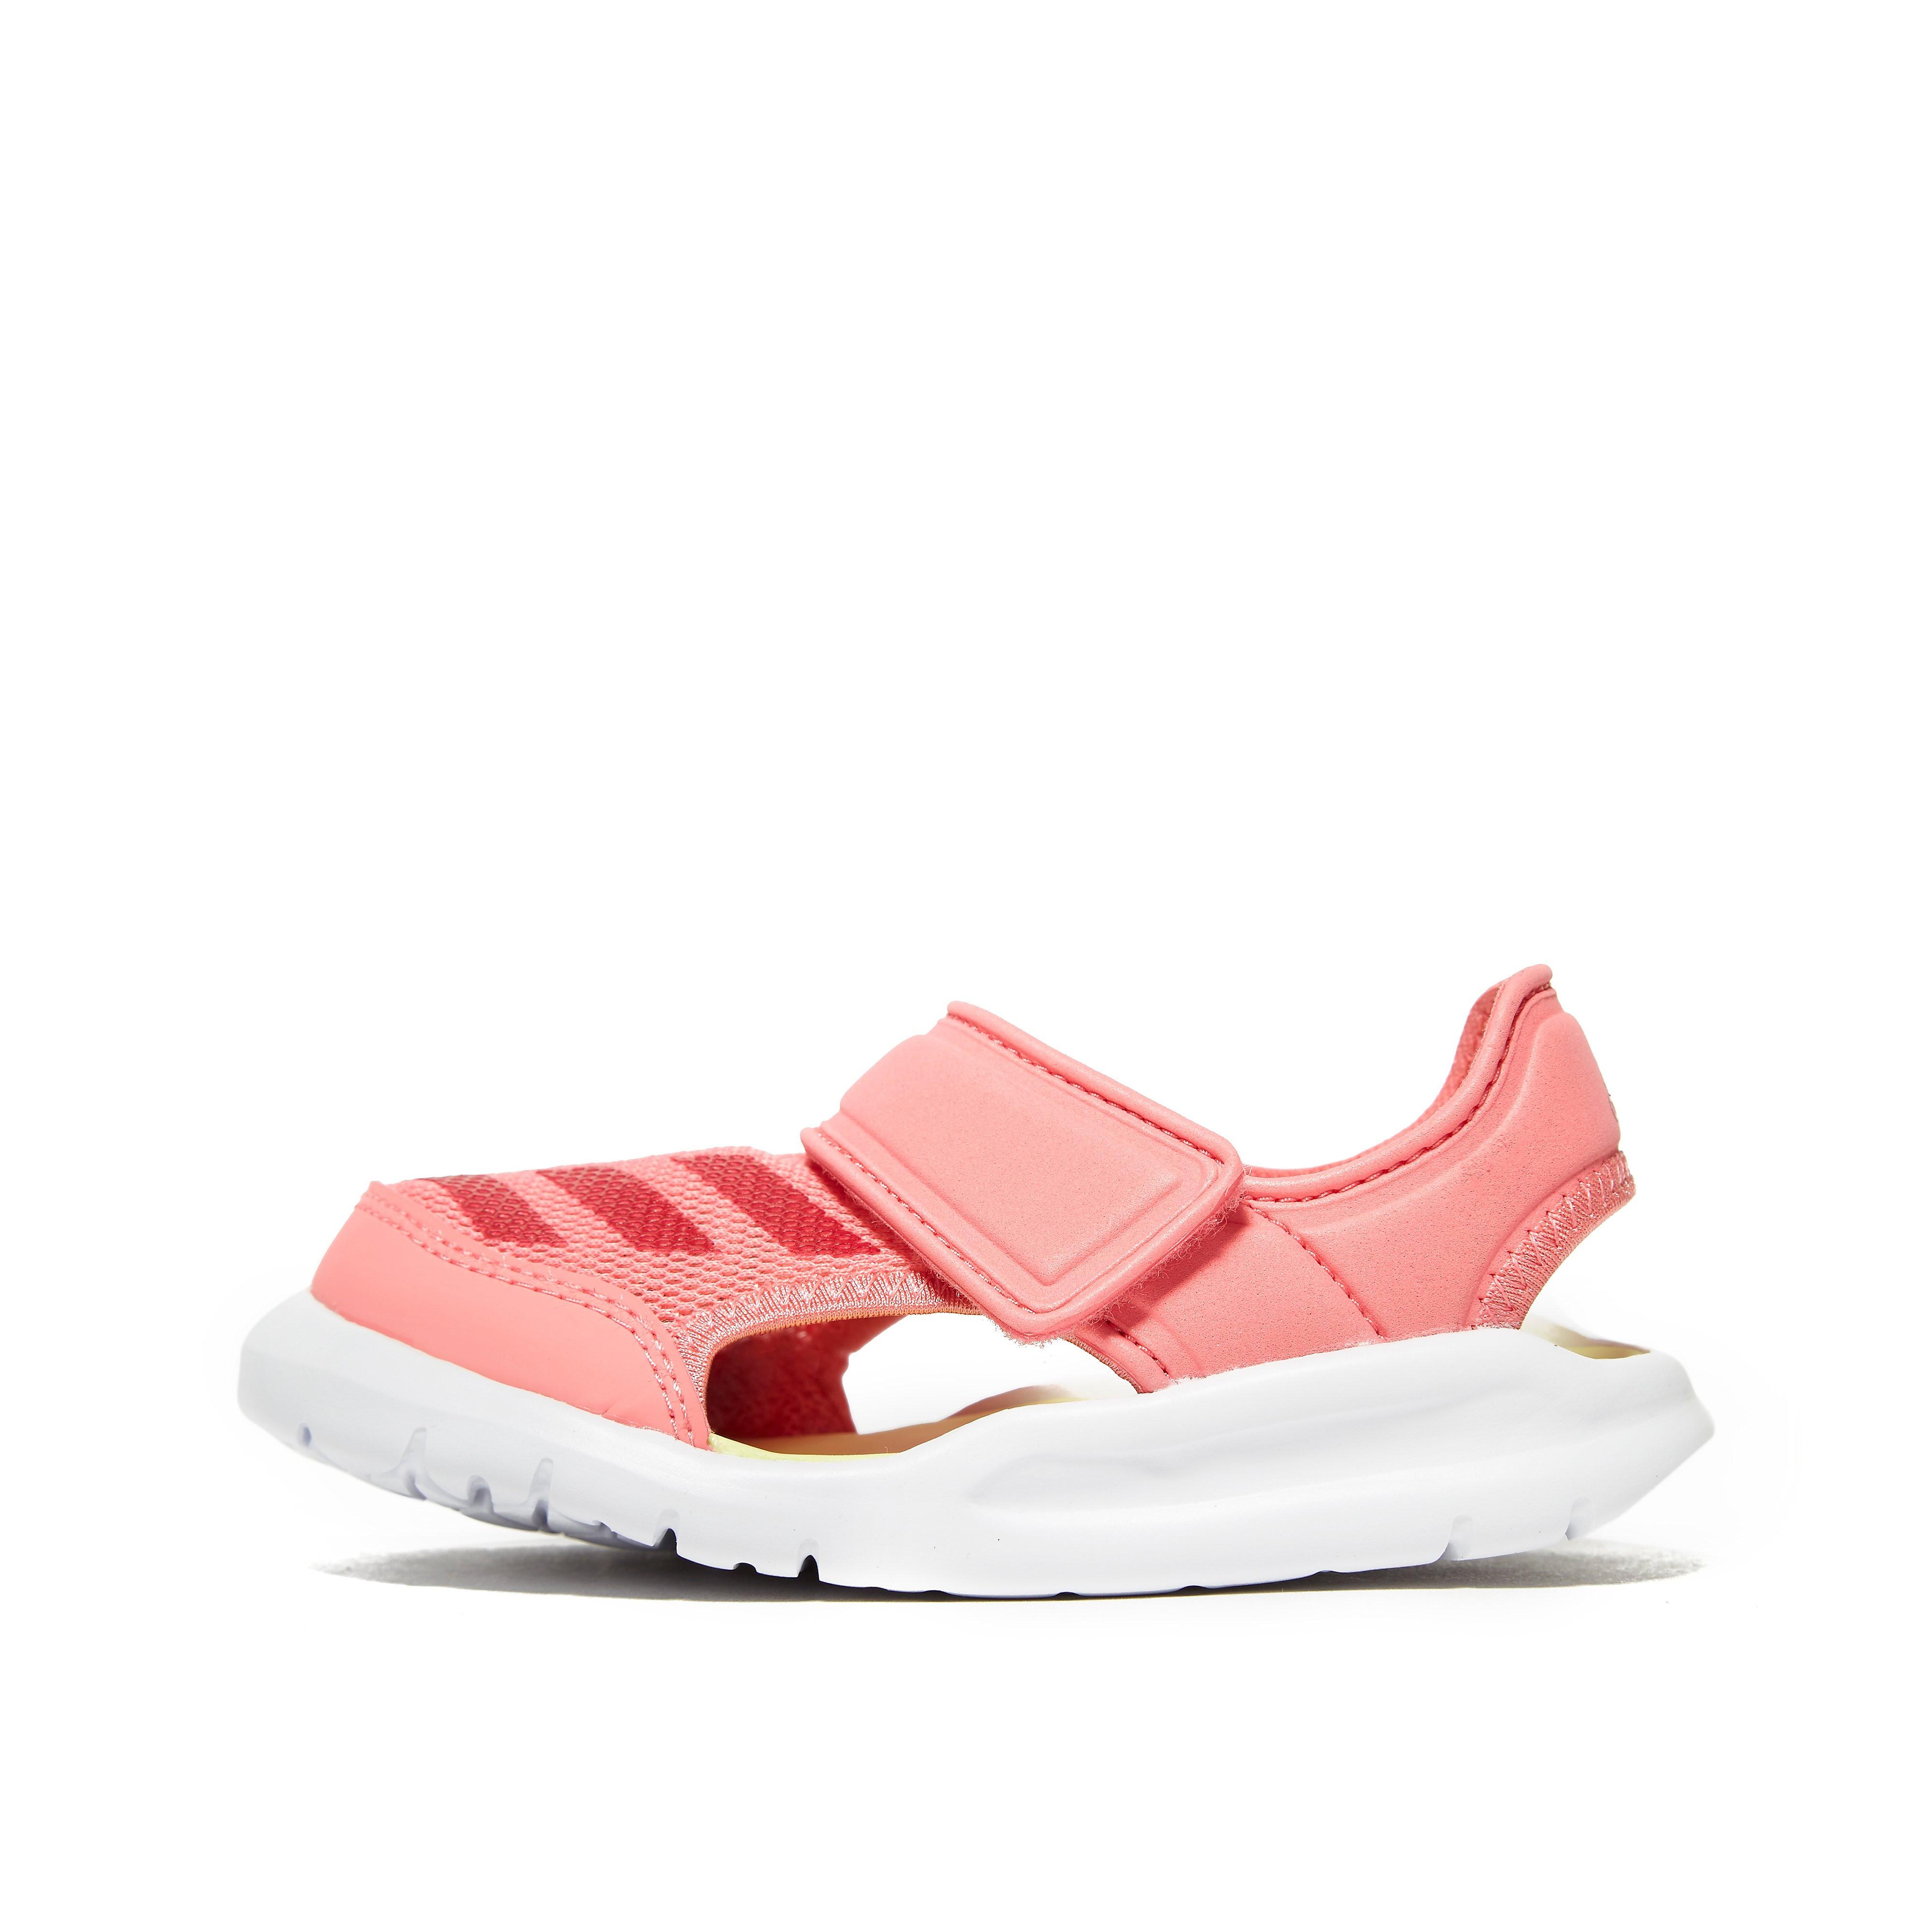 adidas sandalias Forta Swim para bebé